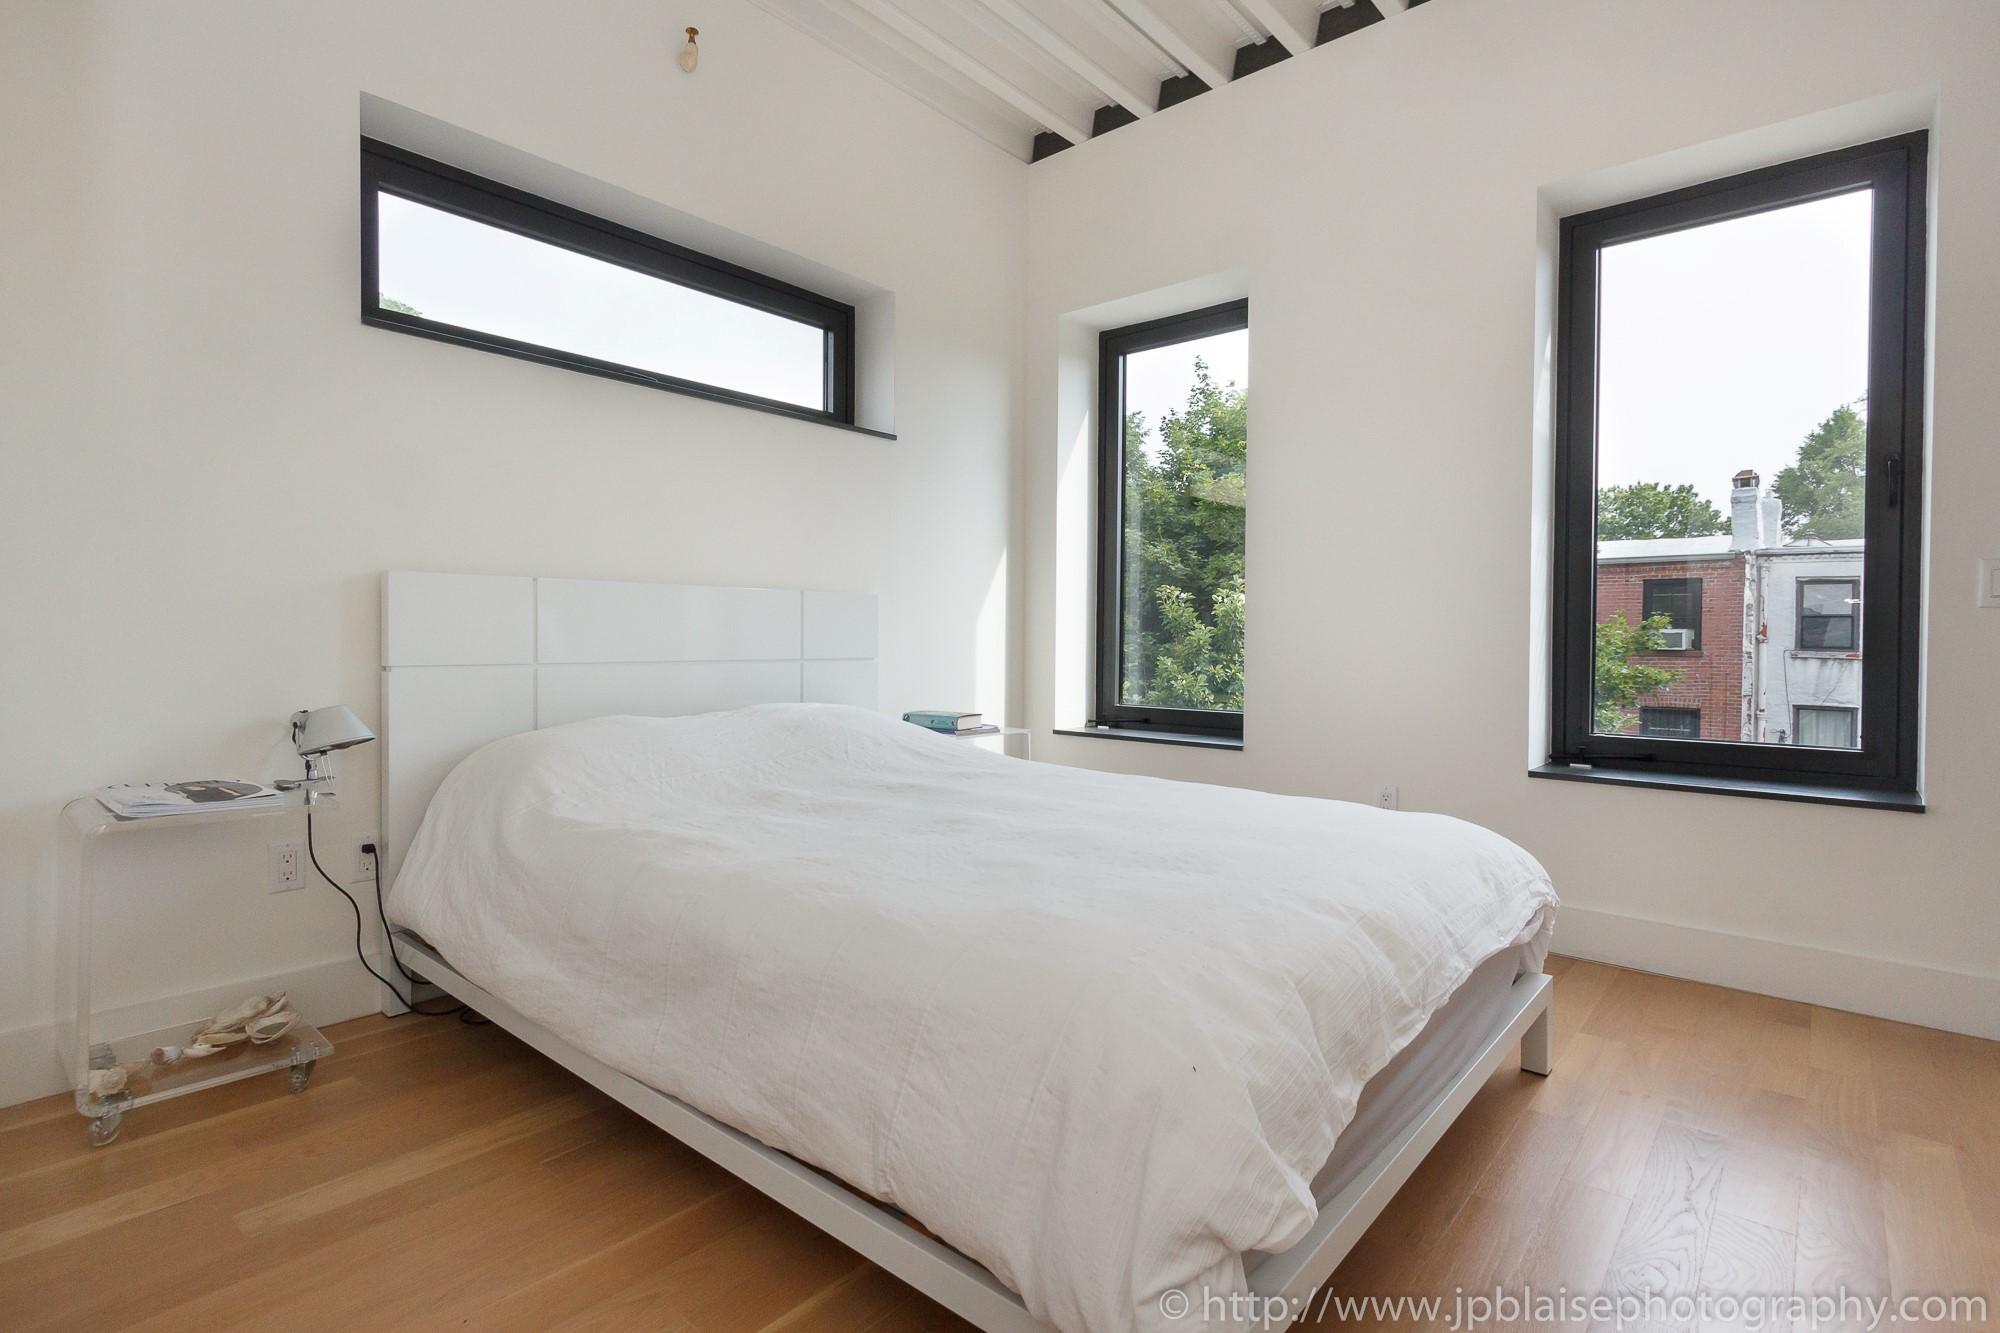 3 bedroom condos in brooklyn bedroom review design for 3 bedroom apartments nyc